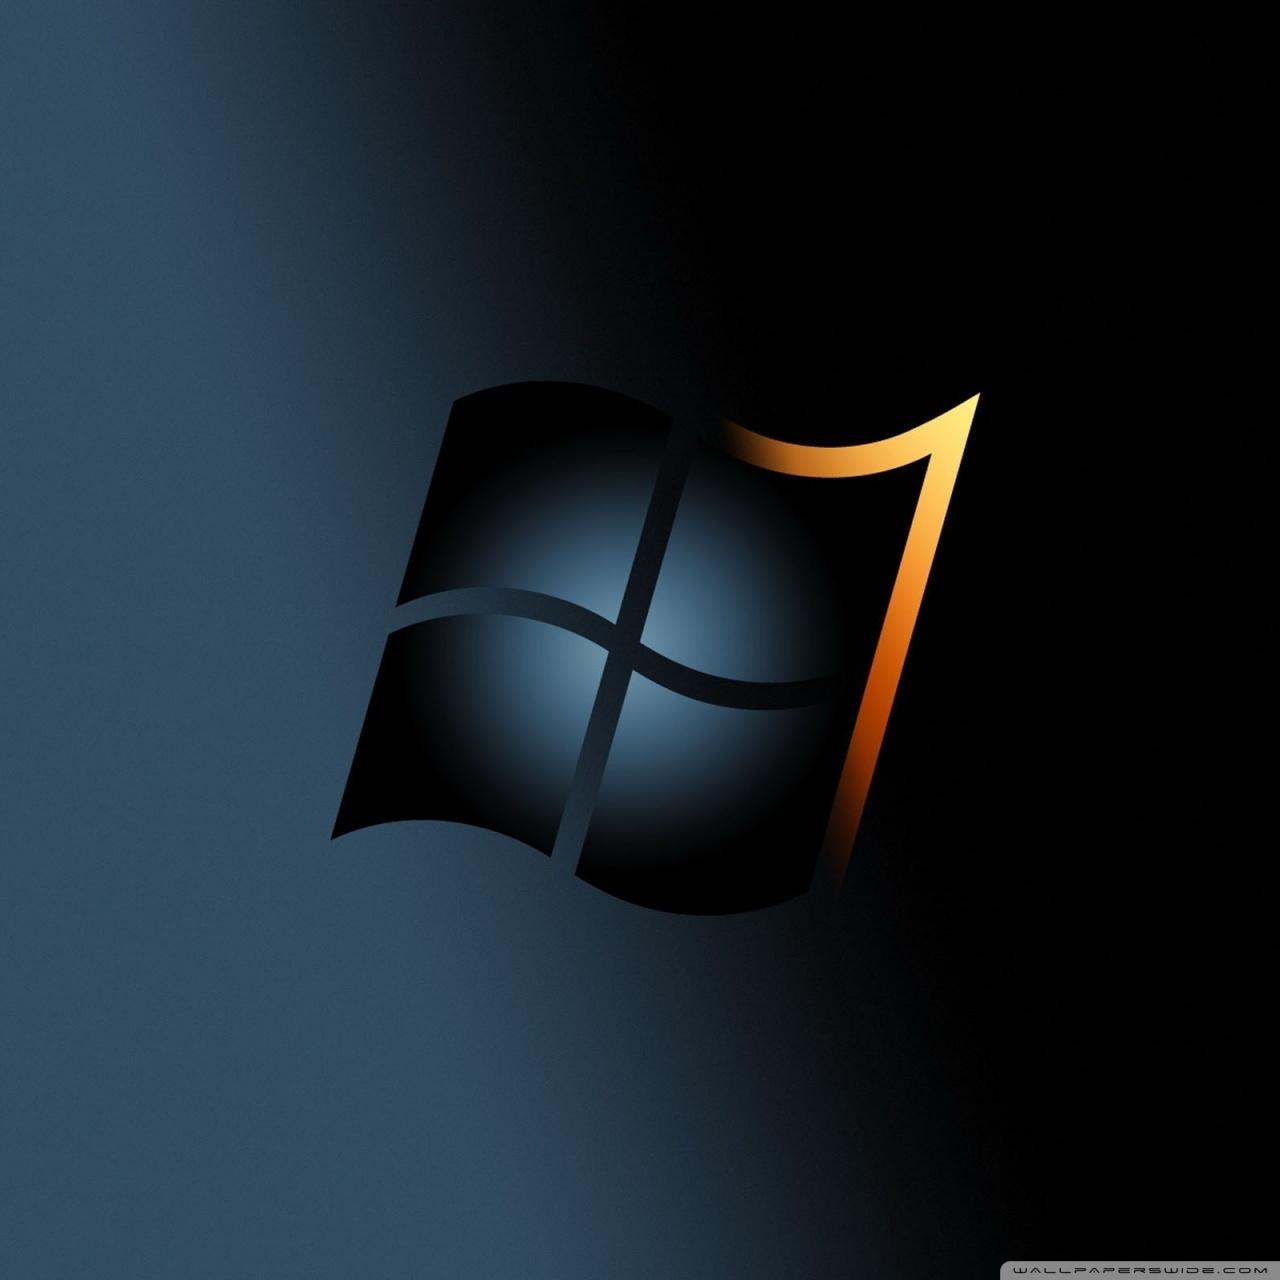 windows 7 dark ❤ uhd desktop wallpaper for ultra hd 4k 8k